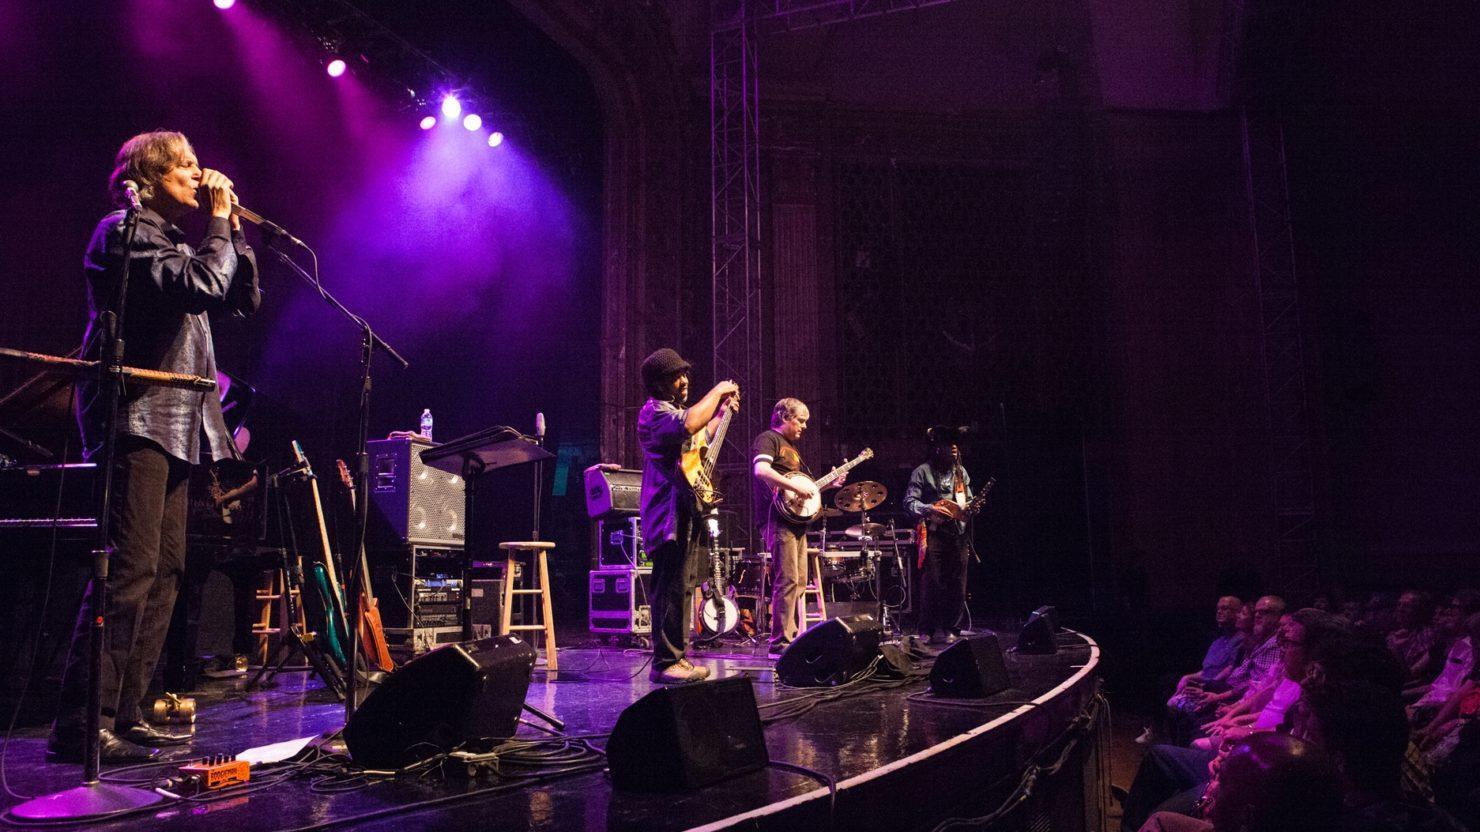 Bela Fleck And Flecktones Tour